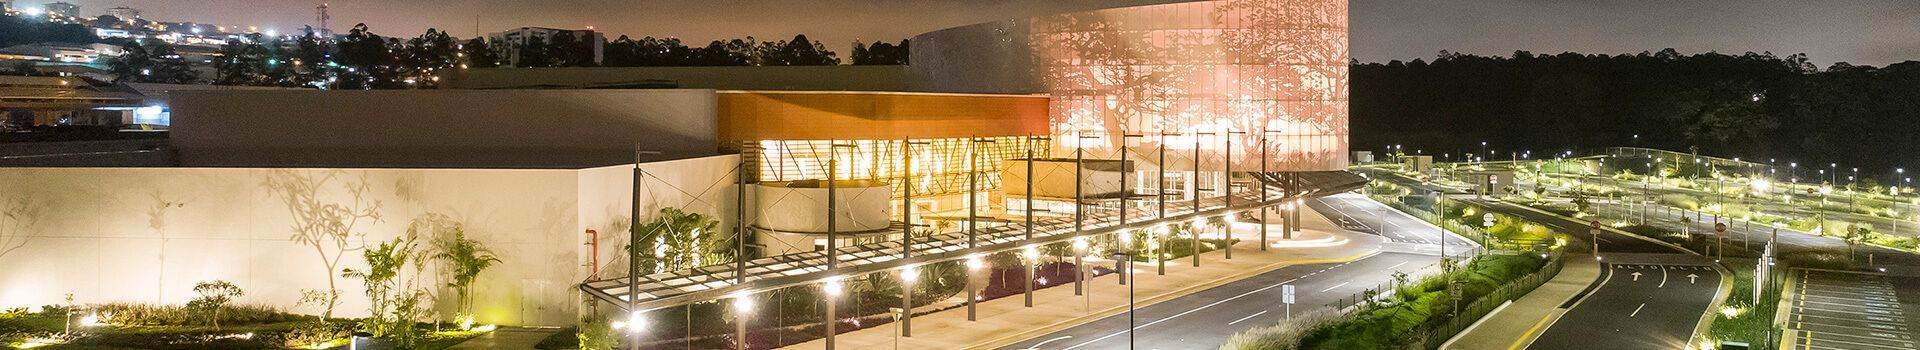 Costa Rica Convention Center | History 1